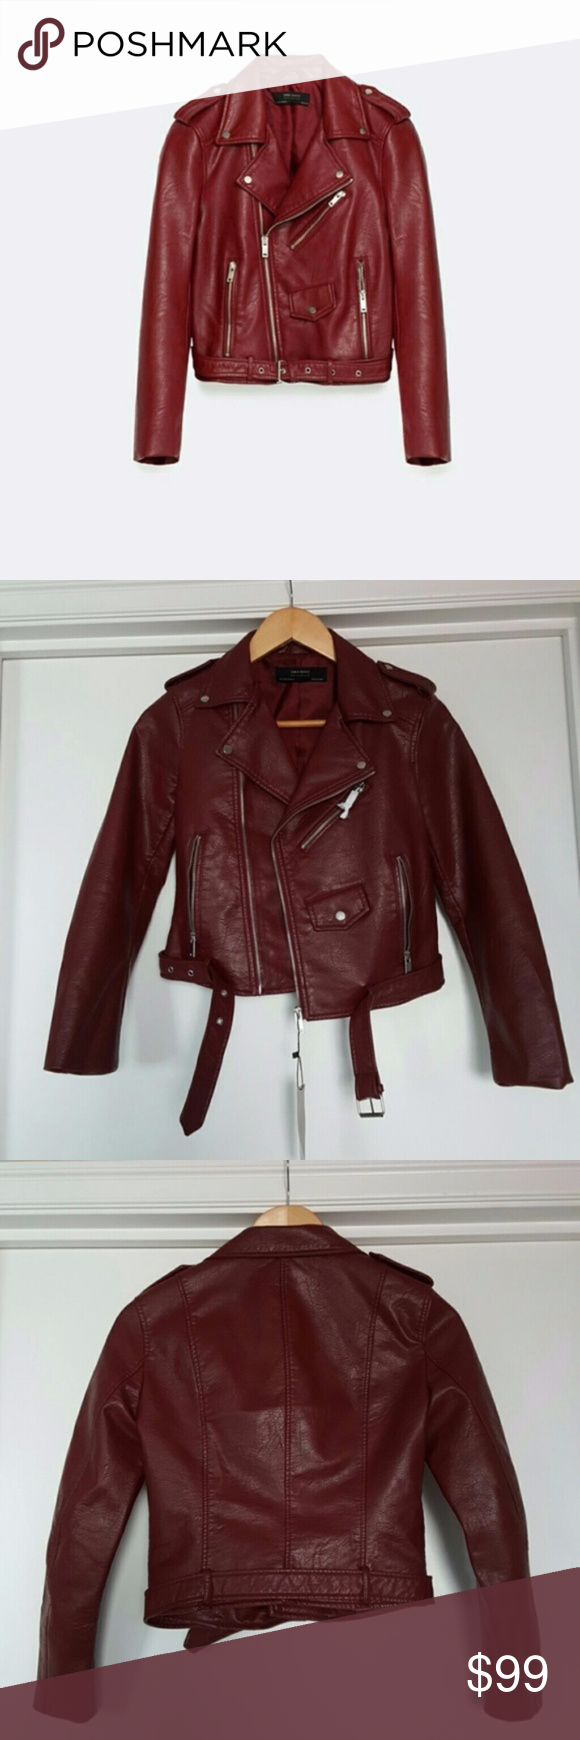 Zara Burgundy Red Leather Effect Jacket Leather fashion